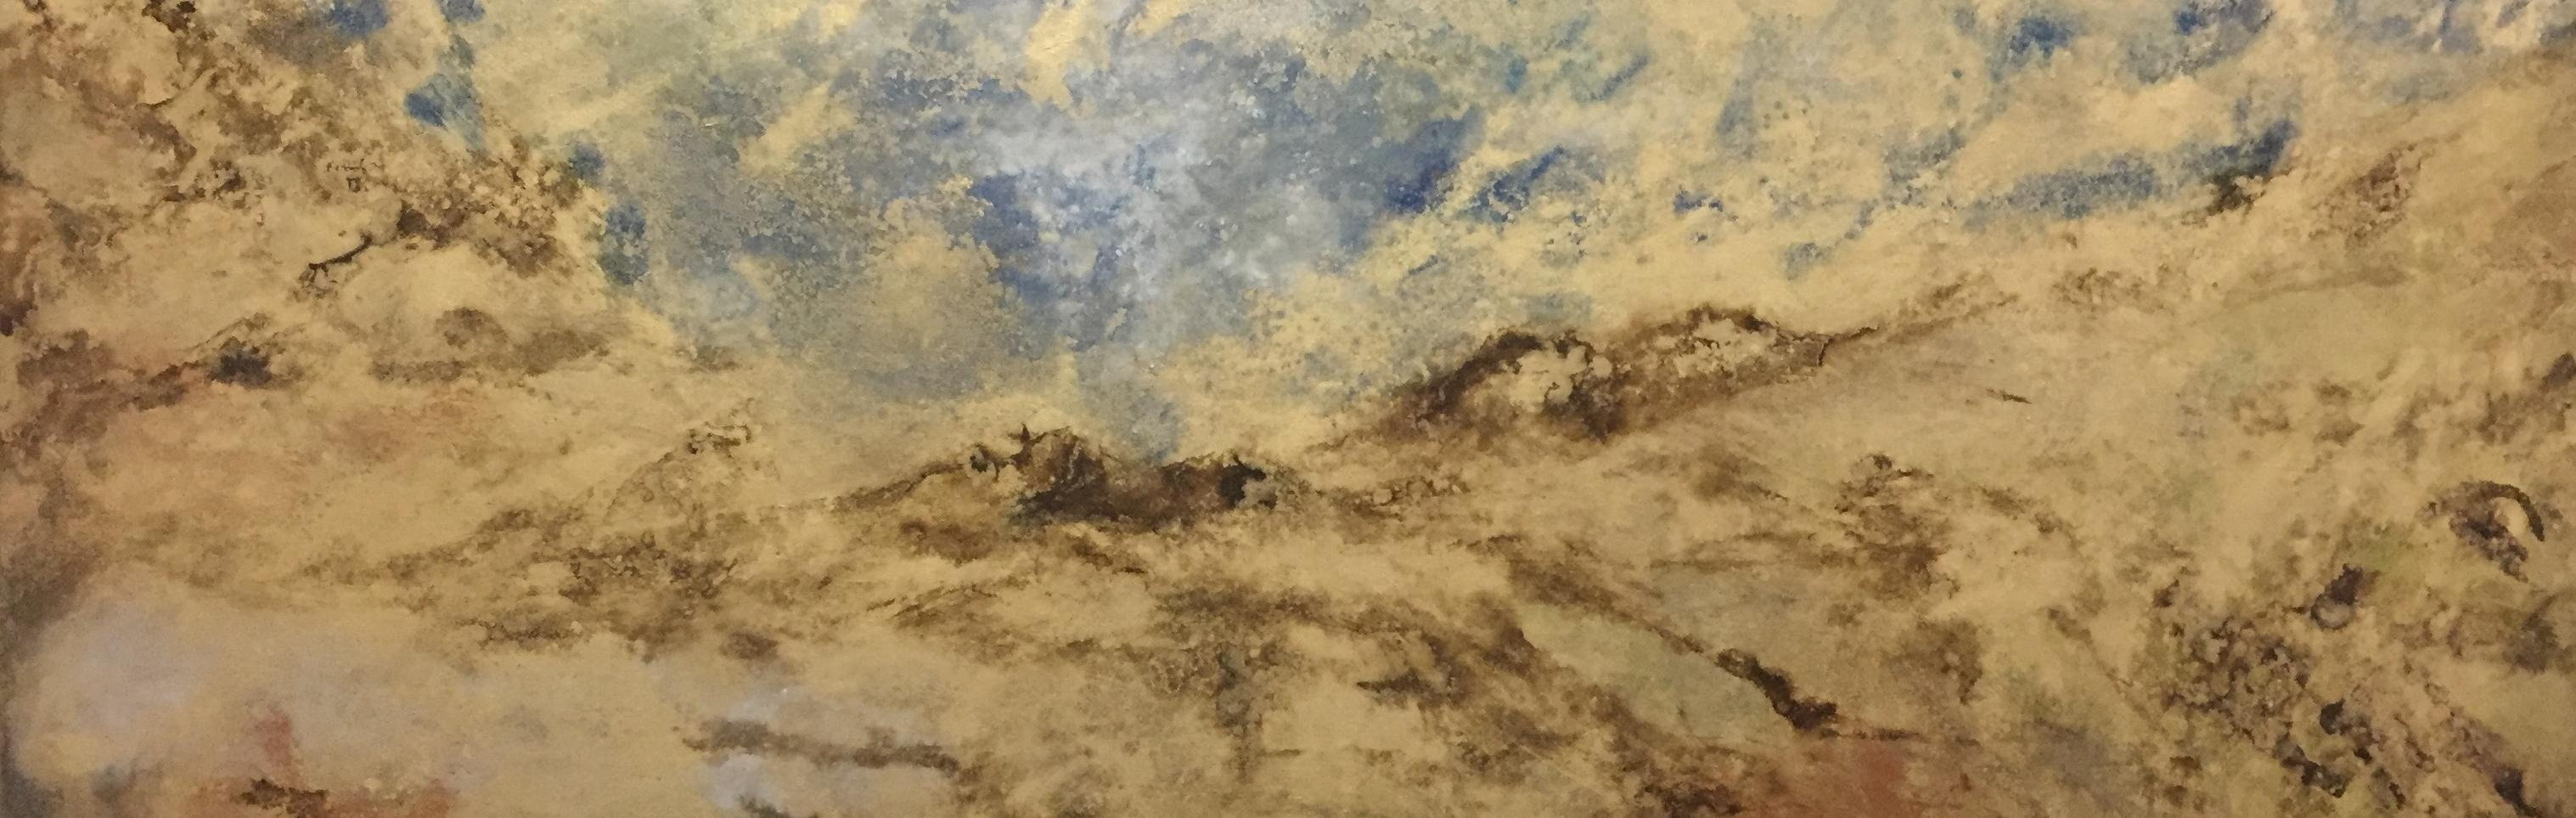 Ecotone, Cloudscape, Sky, Oil, Gold, Blue, Meditative, Gold Leaf, Painting